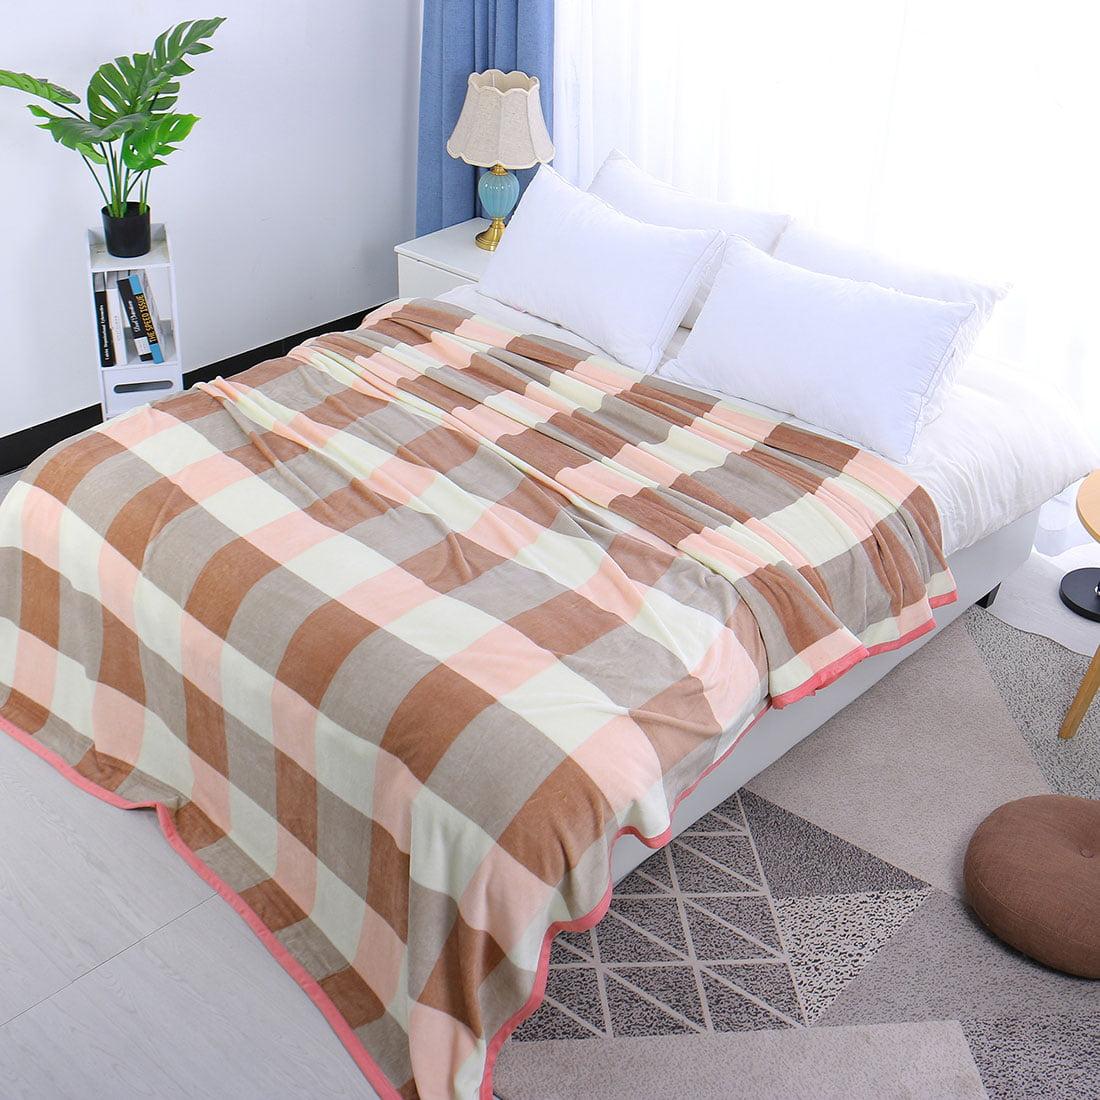 Plaid Soft Plush Fleece Throw Blanket Flannel Queen Size Bed Blankets 78 X90 Walmart Com Walmart Com